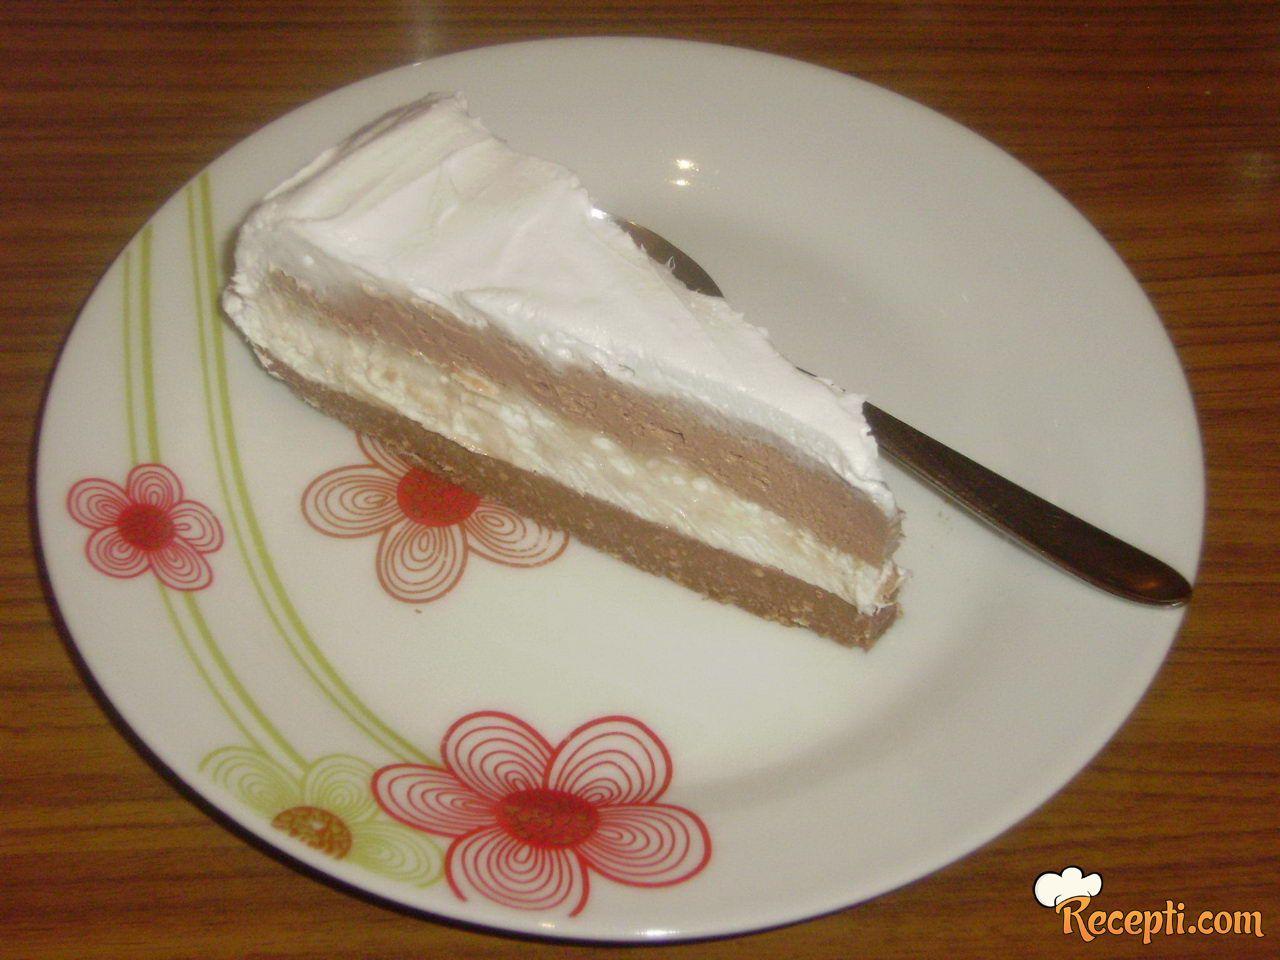 Crno beli cheesecake